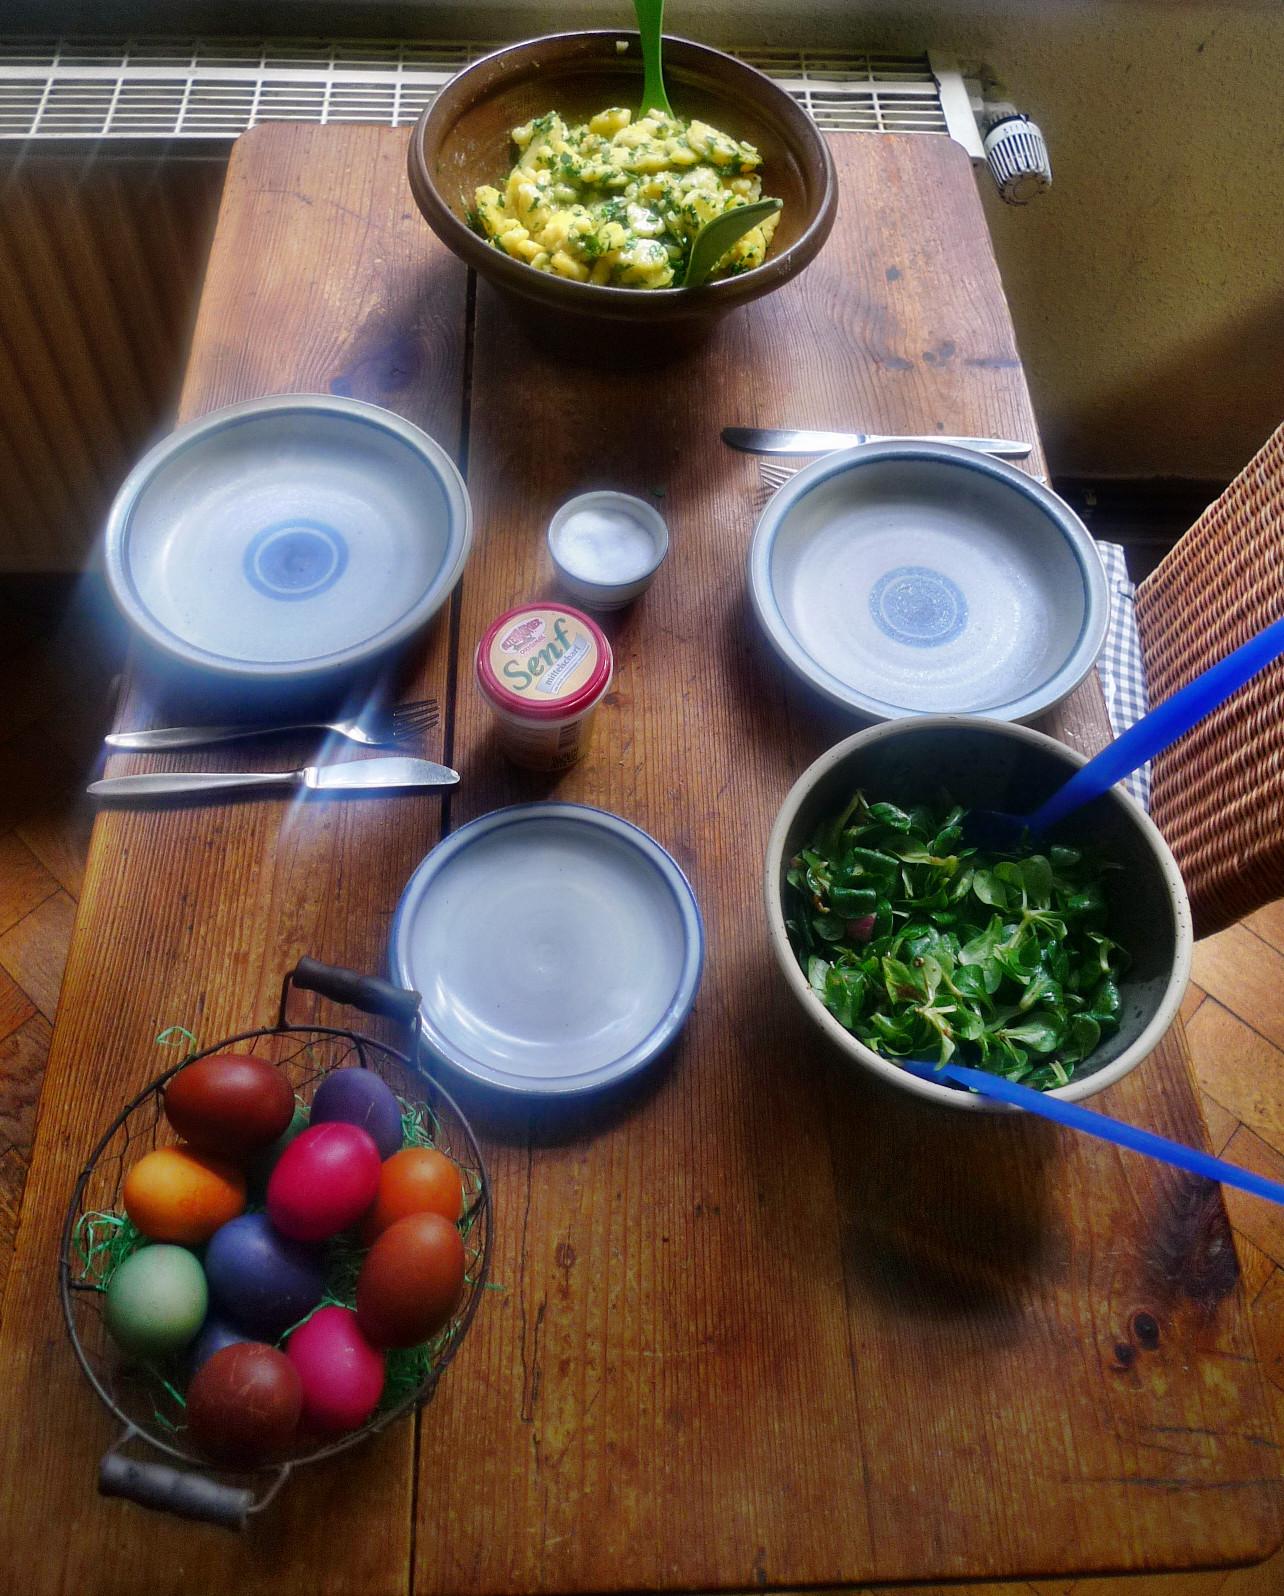 Kartoffelsalat mit Bärlauch,Feldsalat,Ostereier - 6.4.15   (5)